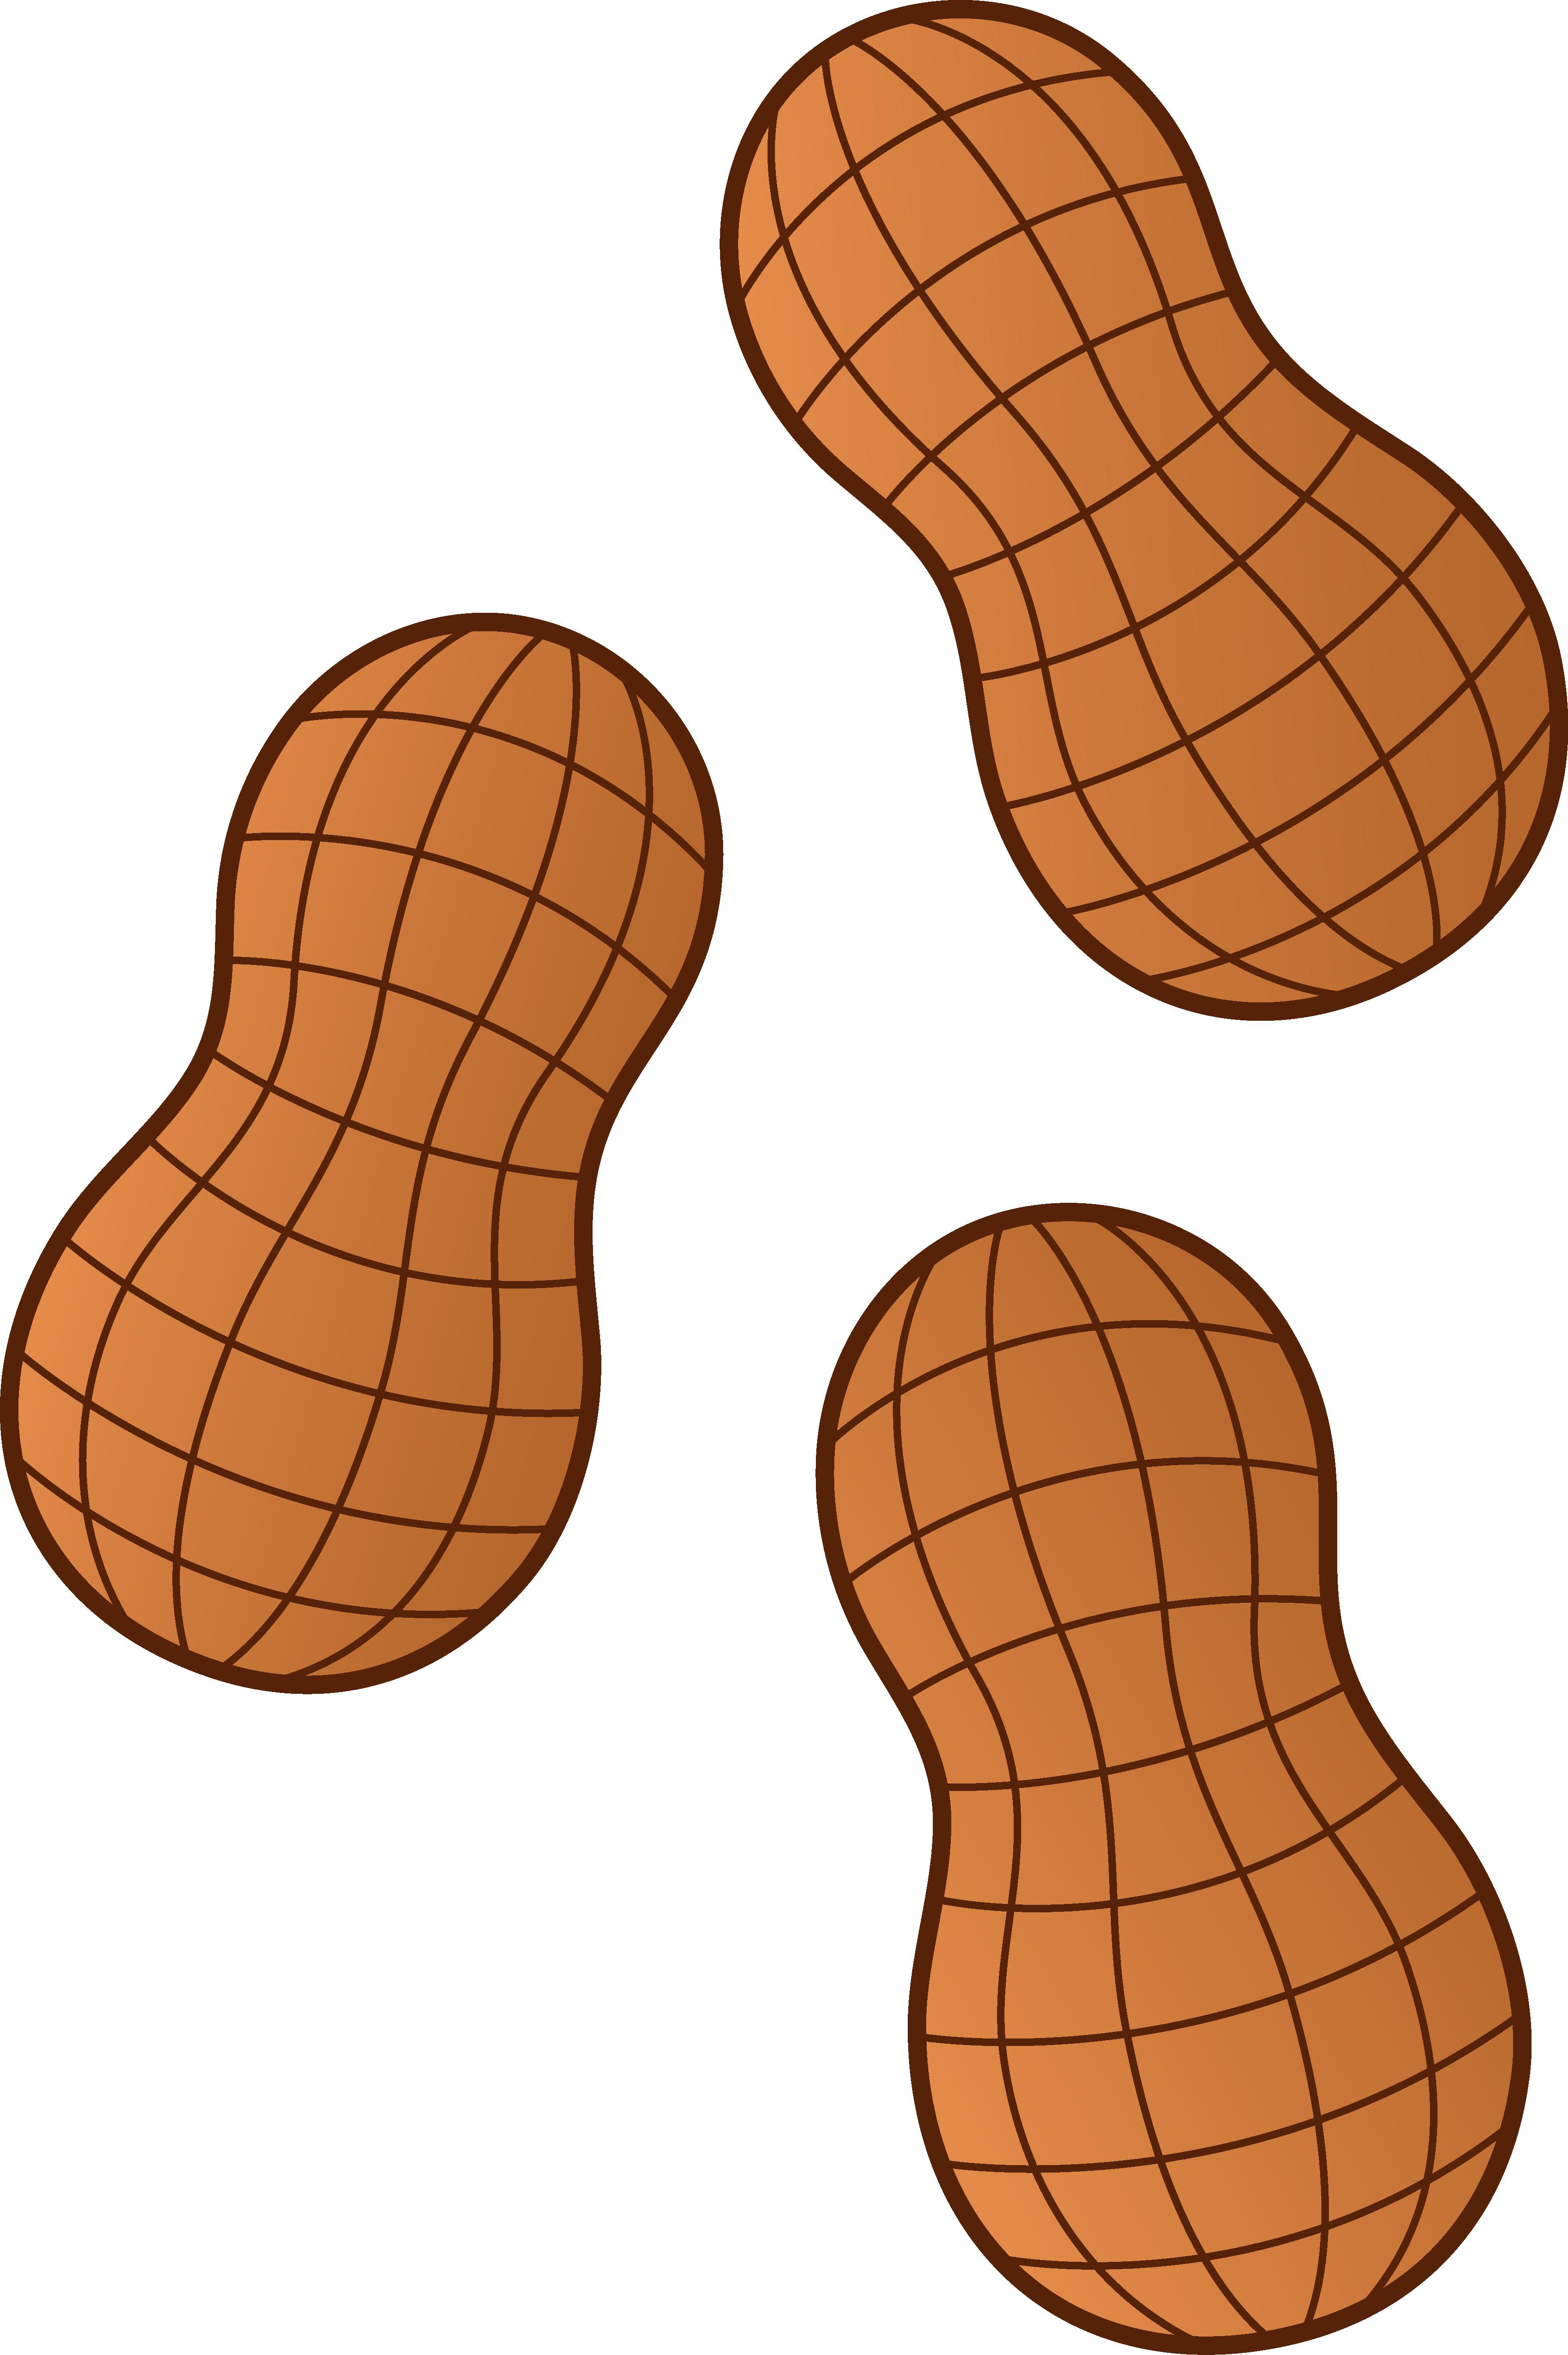 Peanut Butter clipart groundnut Free on Peanut Clip